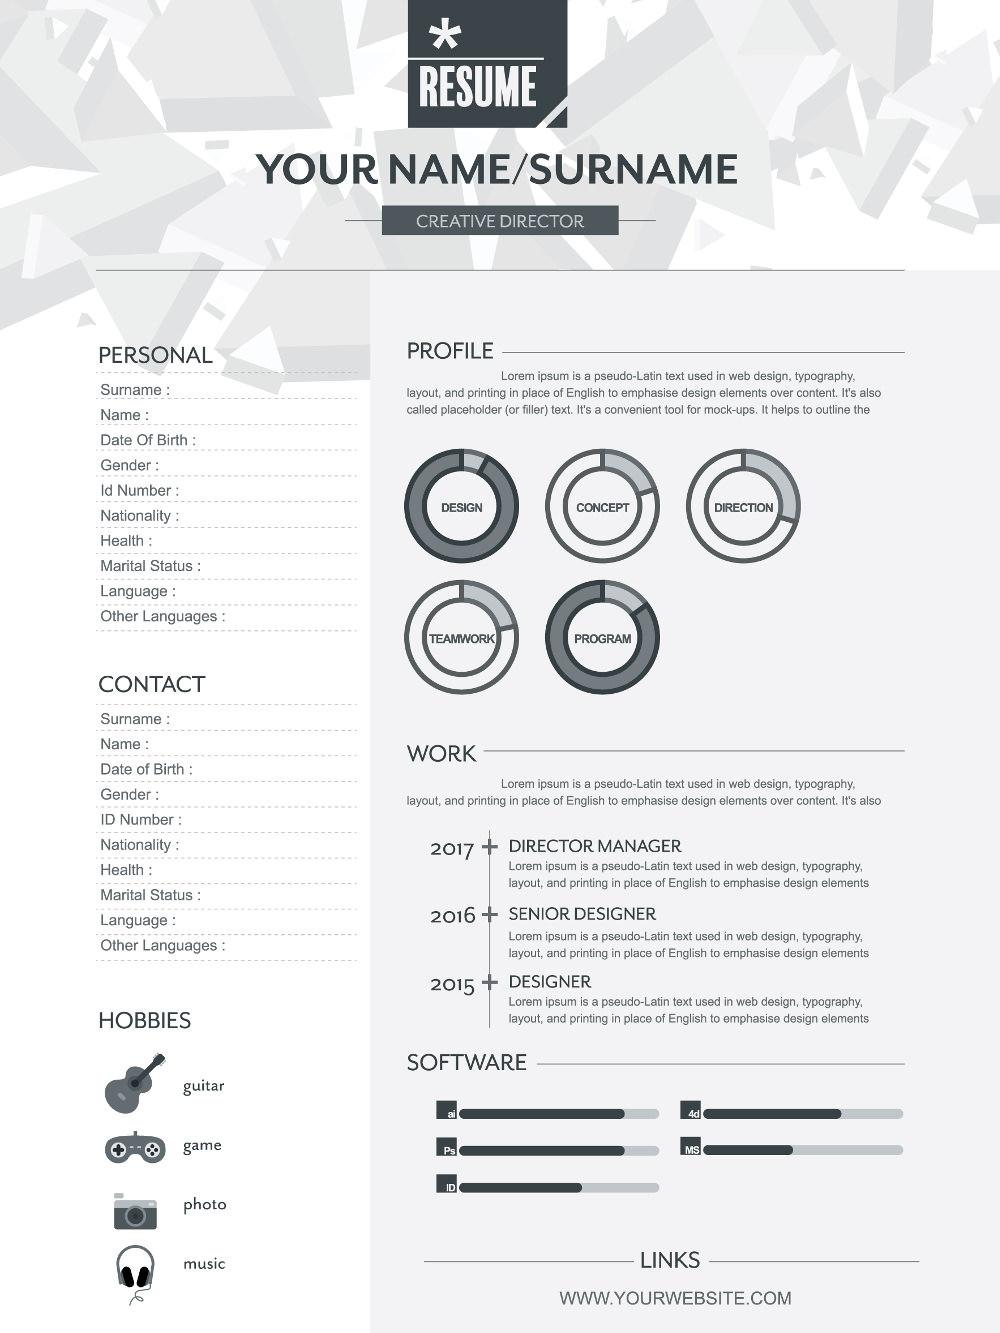 Bewerbungsdesign-kreative-Bewerbung-03.jpg